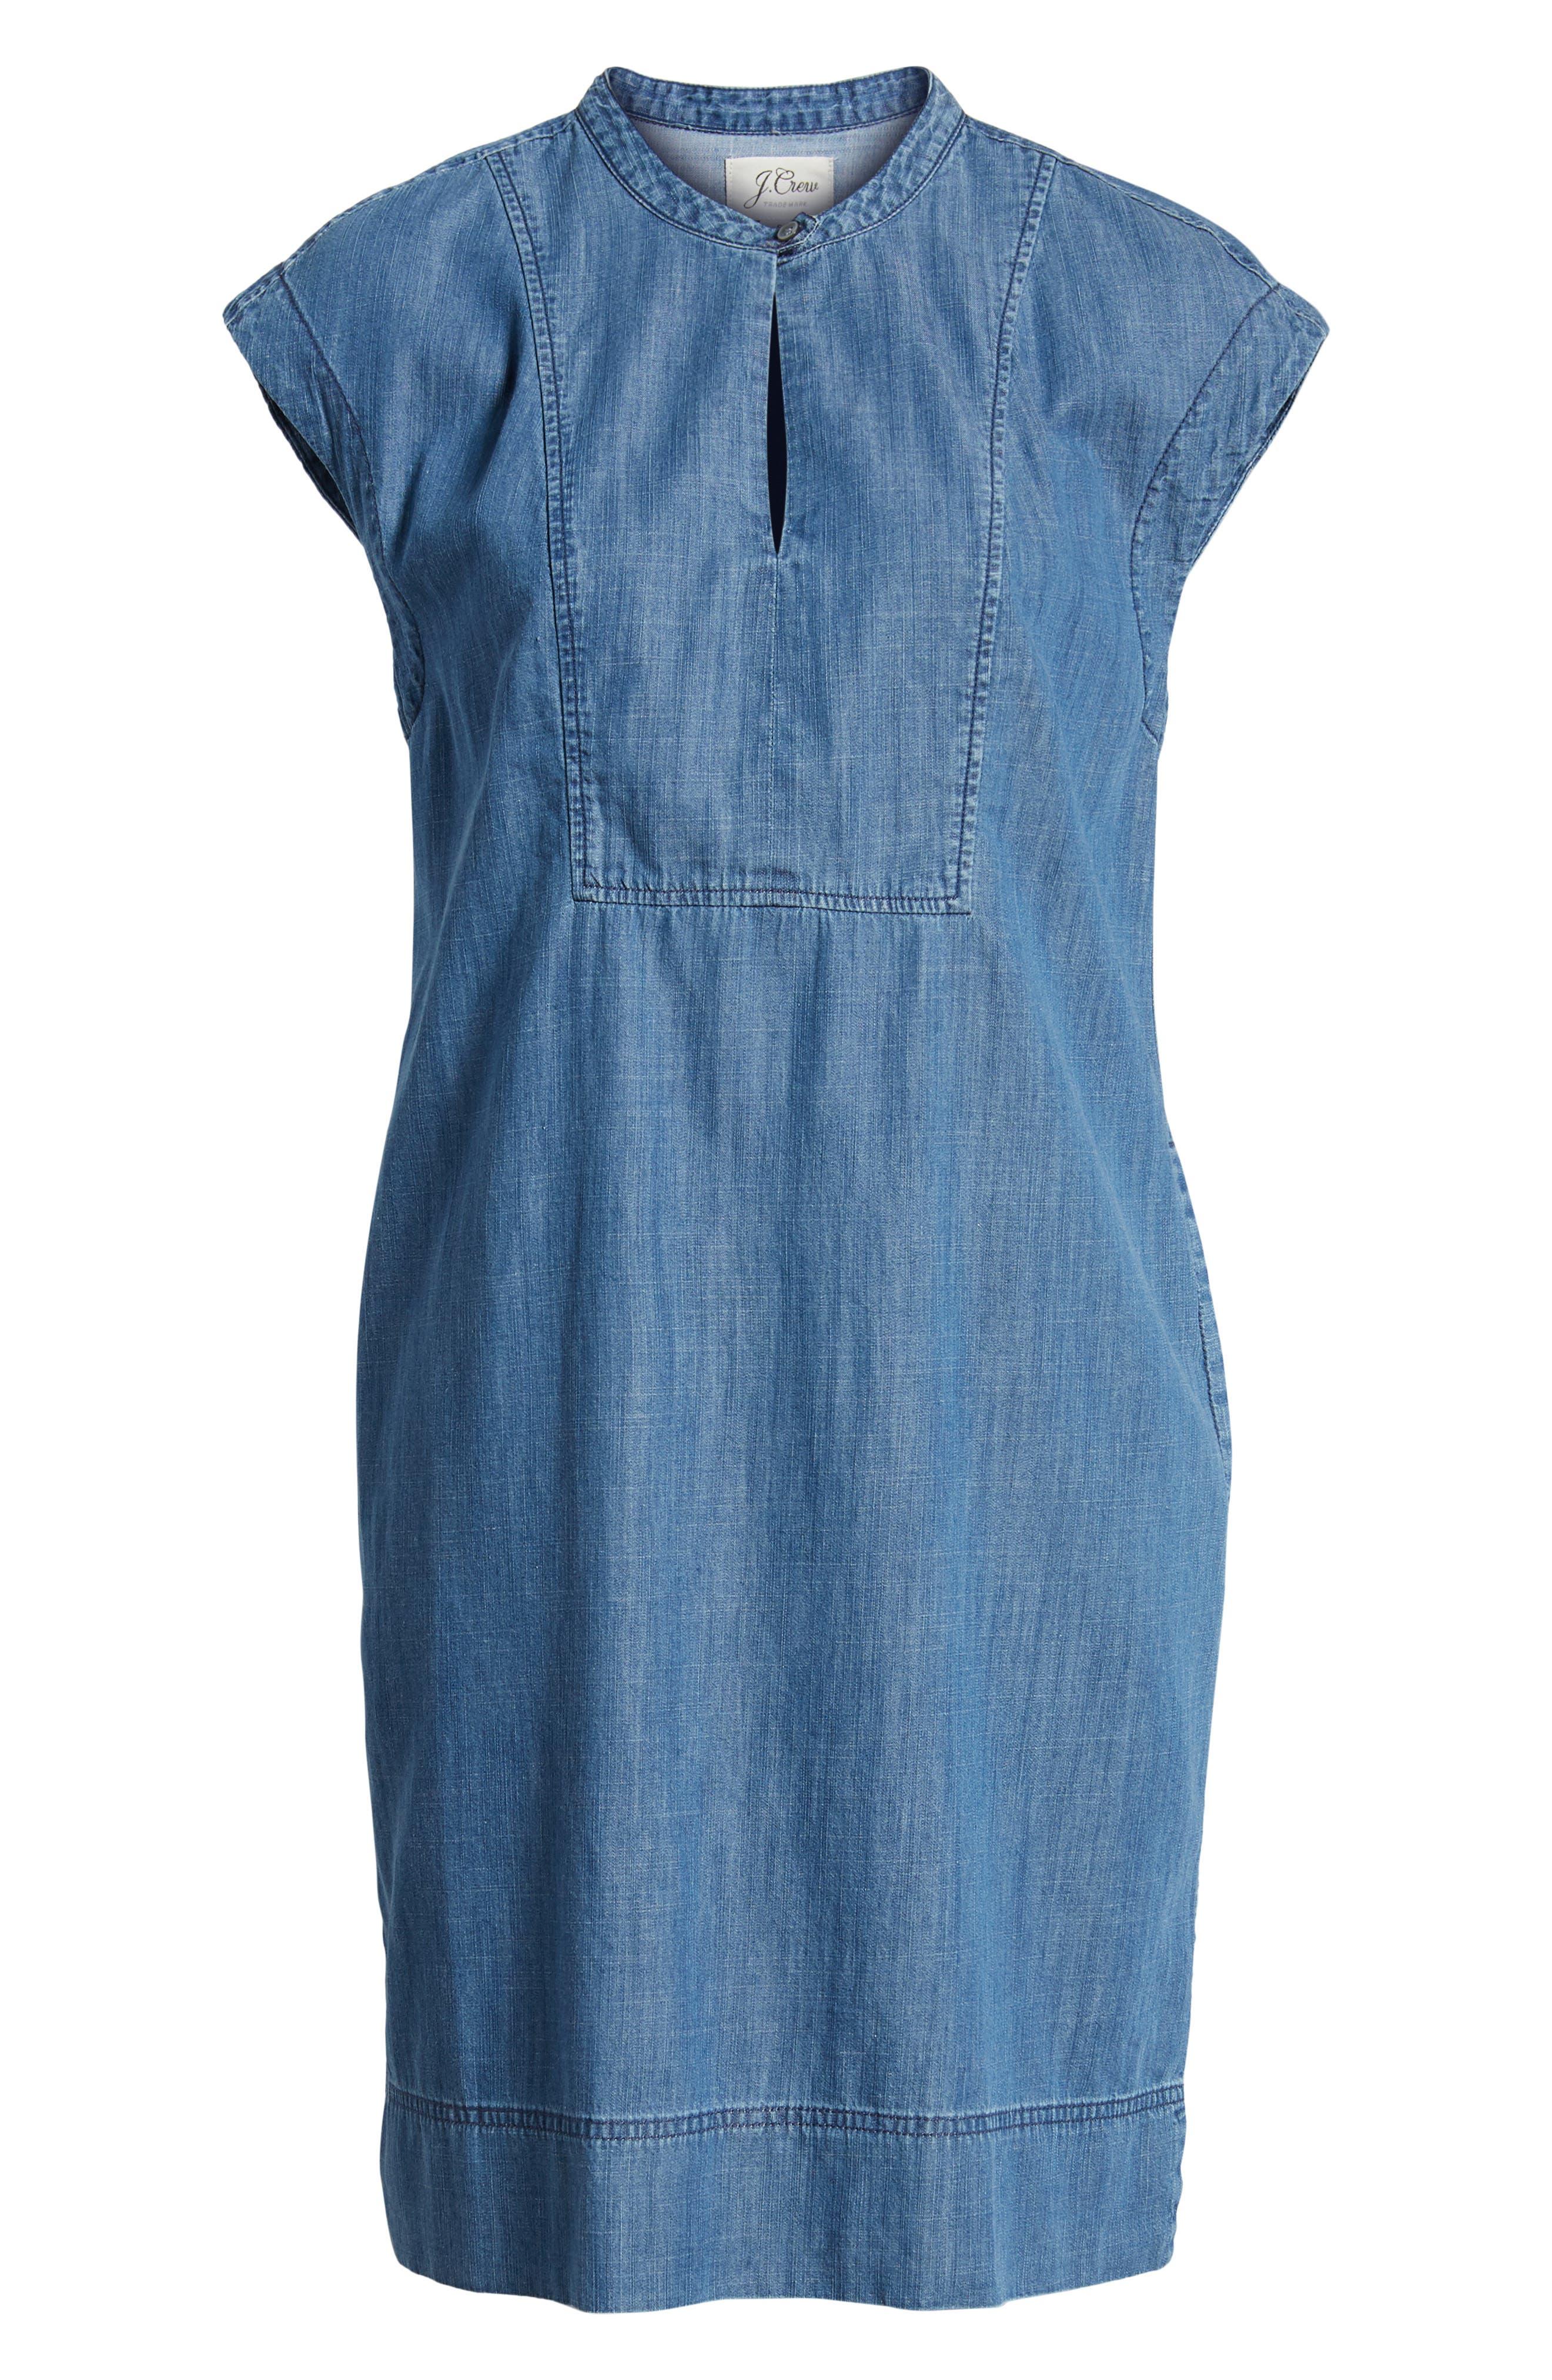 Dorado Keyhole Chambray Dress,                             Alternate thumbnail 6, color,                             400